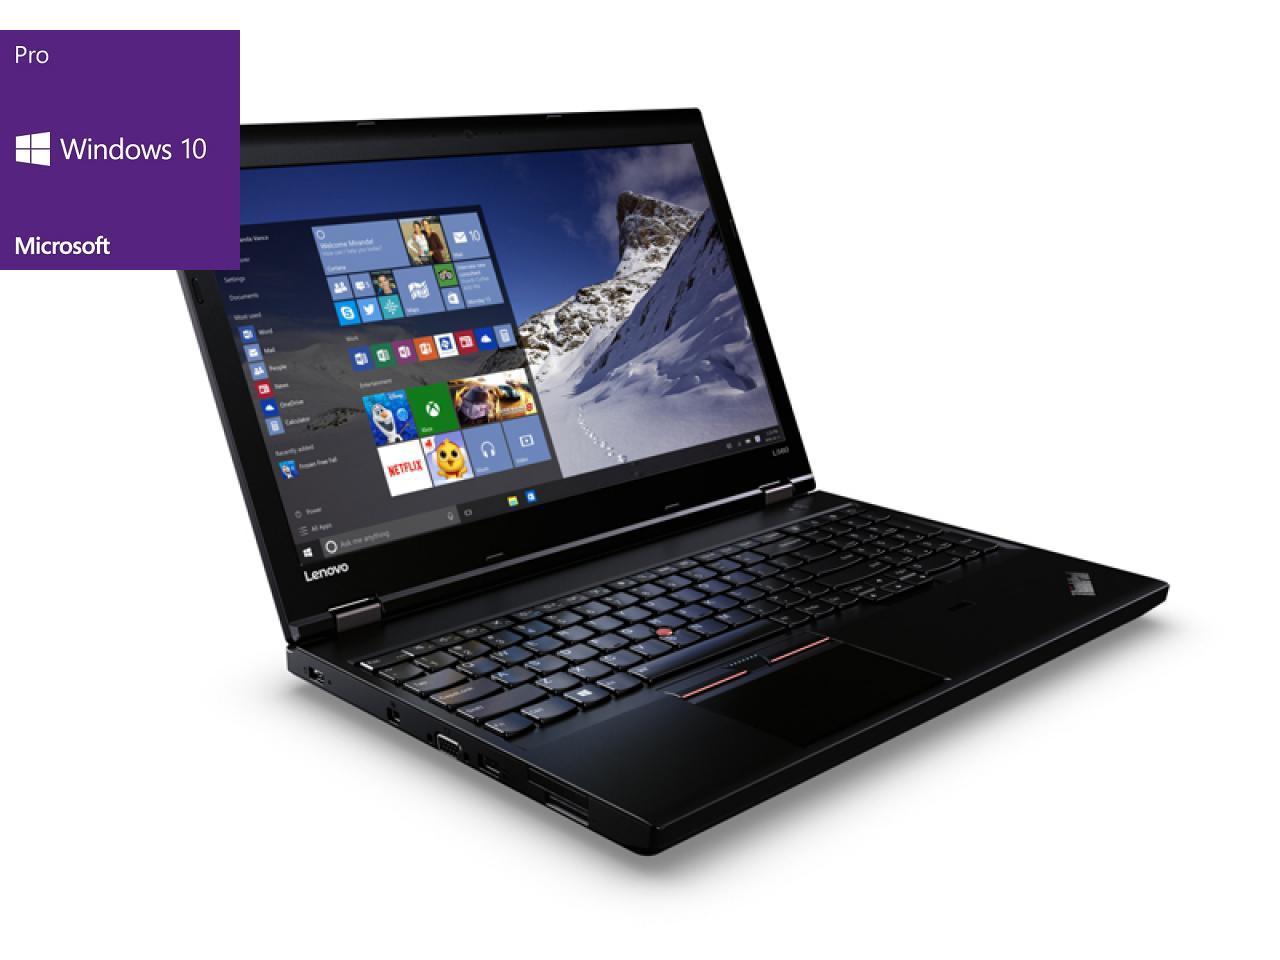 Lenovo ThinkPad L560  - shop.bb-net.de